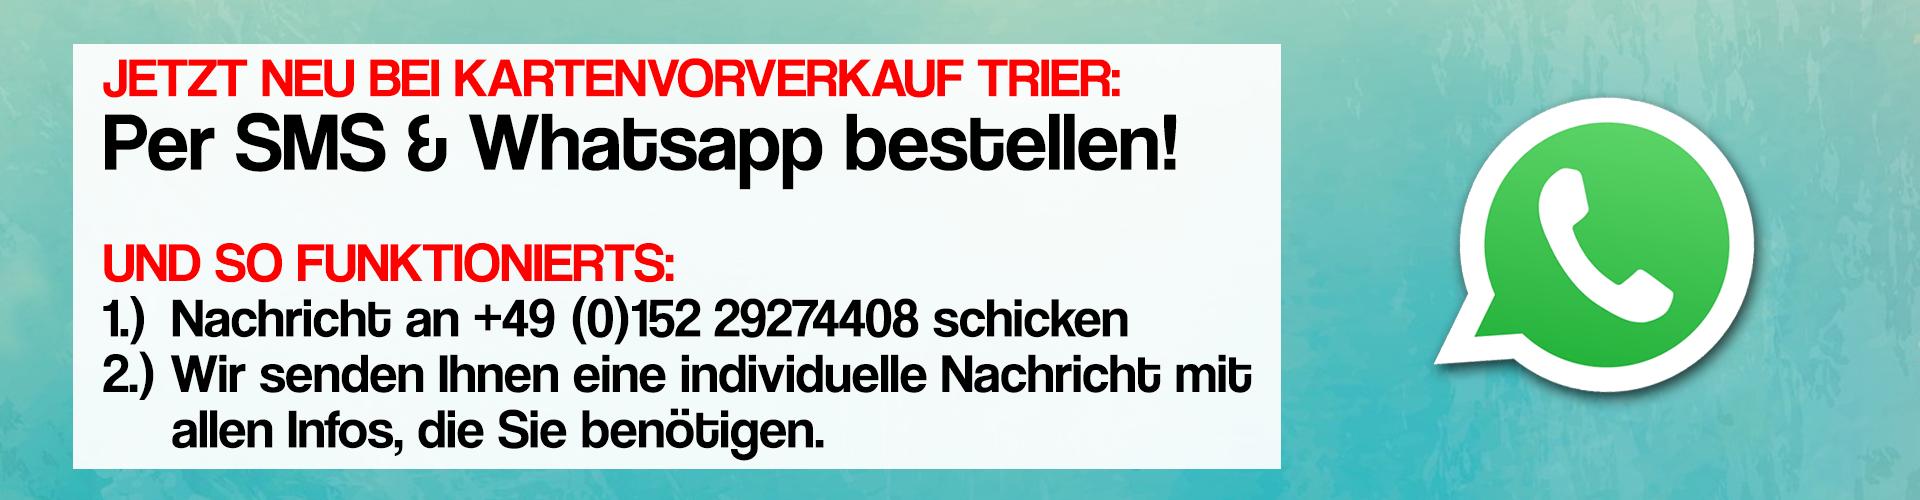 Per Whatsapp bestellen